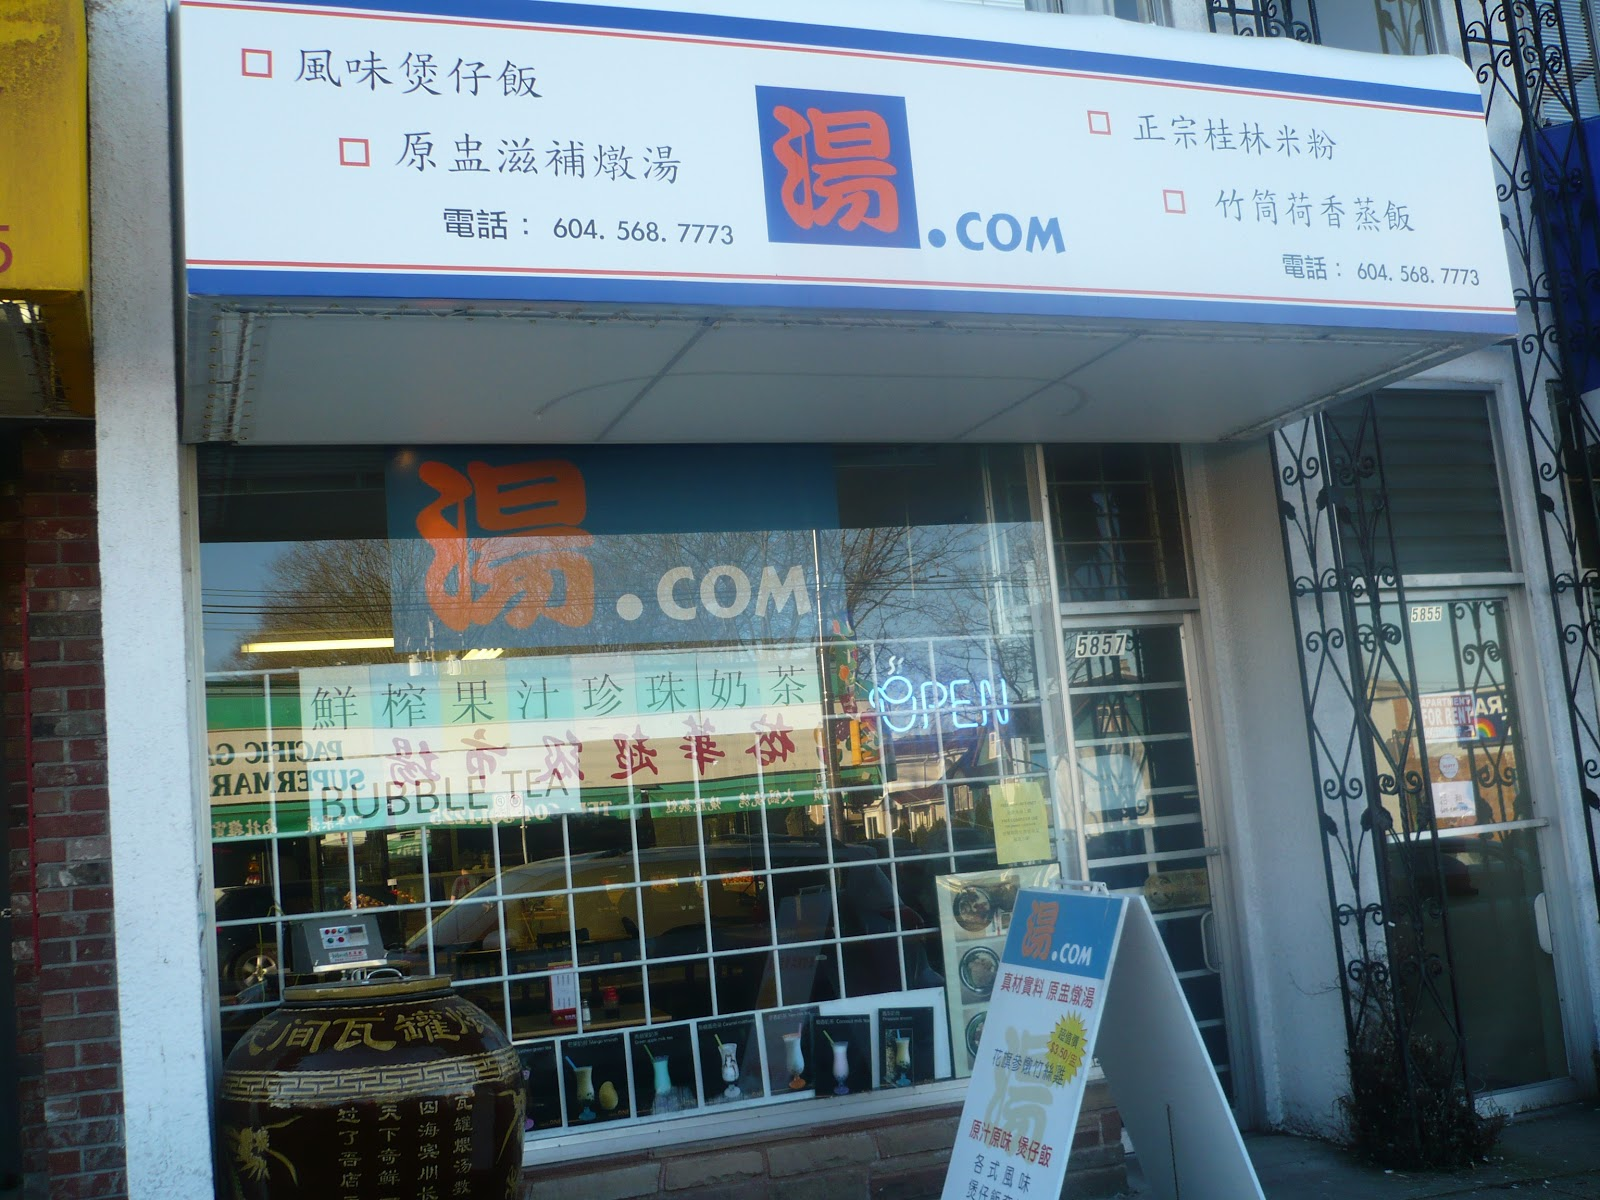 FOOD FOR BUDDHA: The Soup House 湯.com